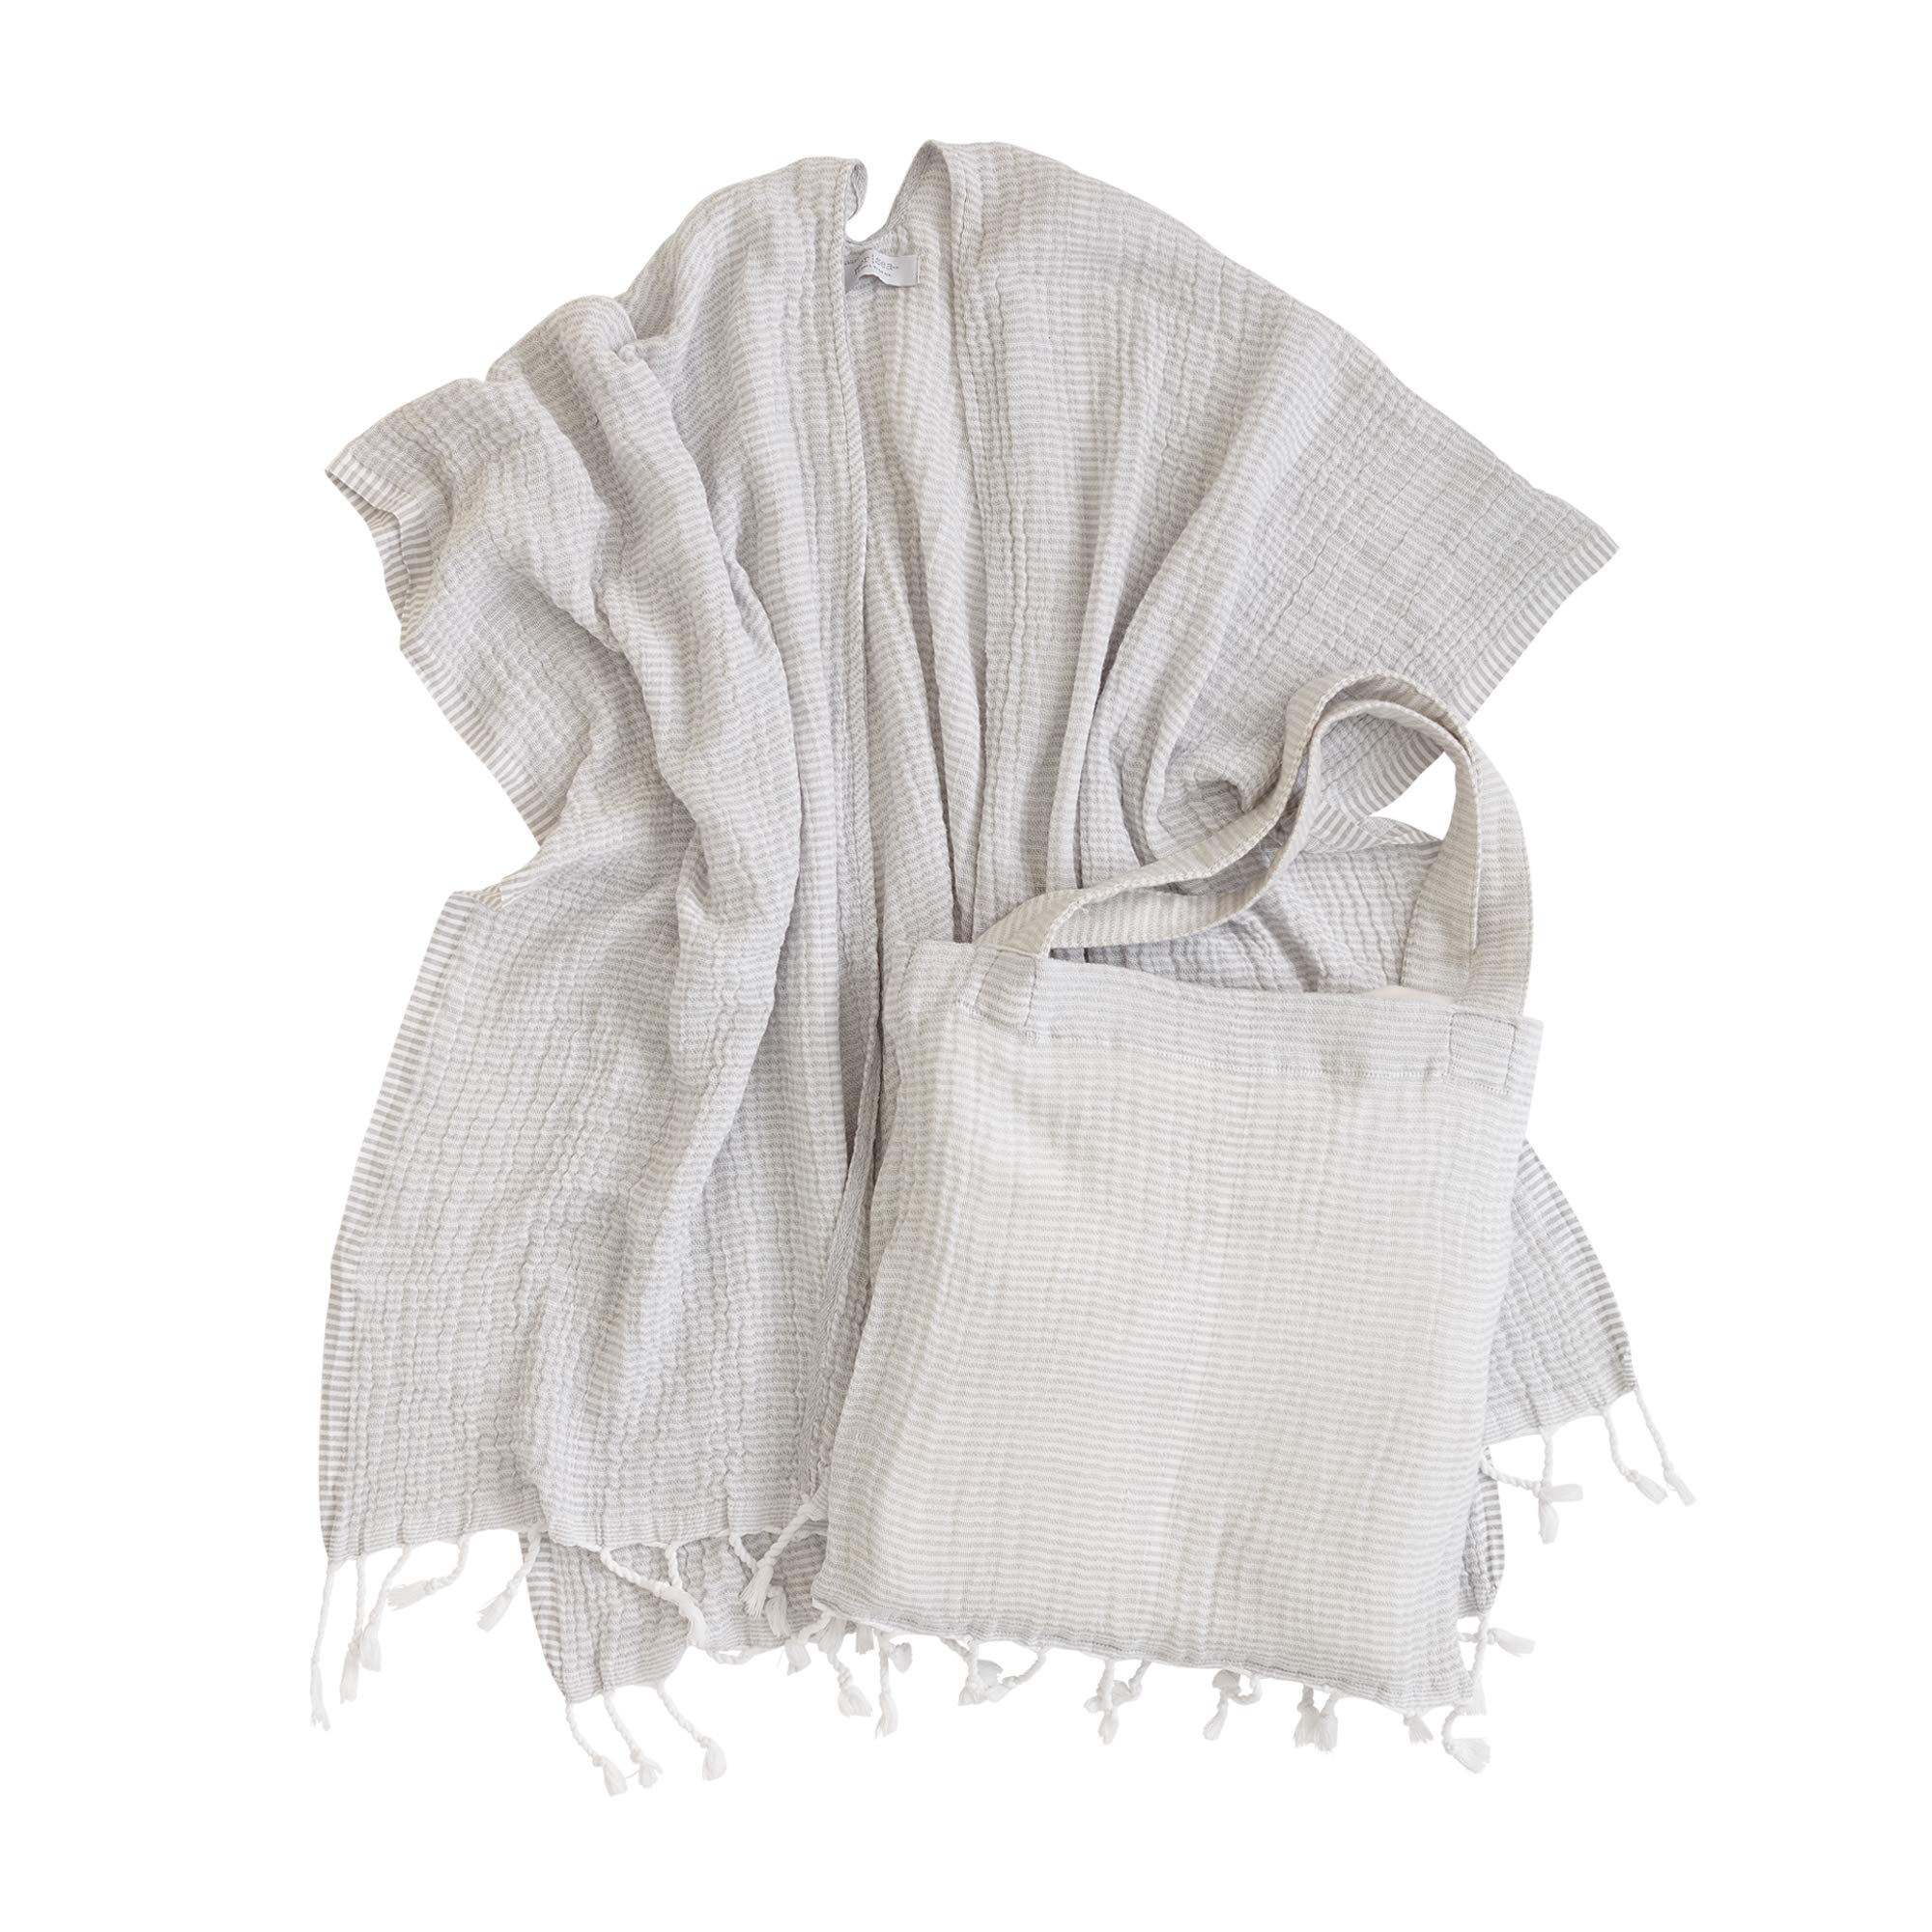 Mer Sea & Co Luxury Beach Wrap with Tote Bag - Light Grey Stripes - 100% Cotton (43'' x 65'')